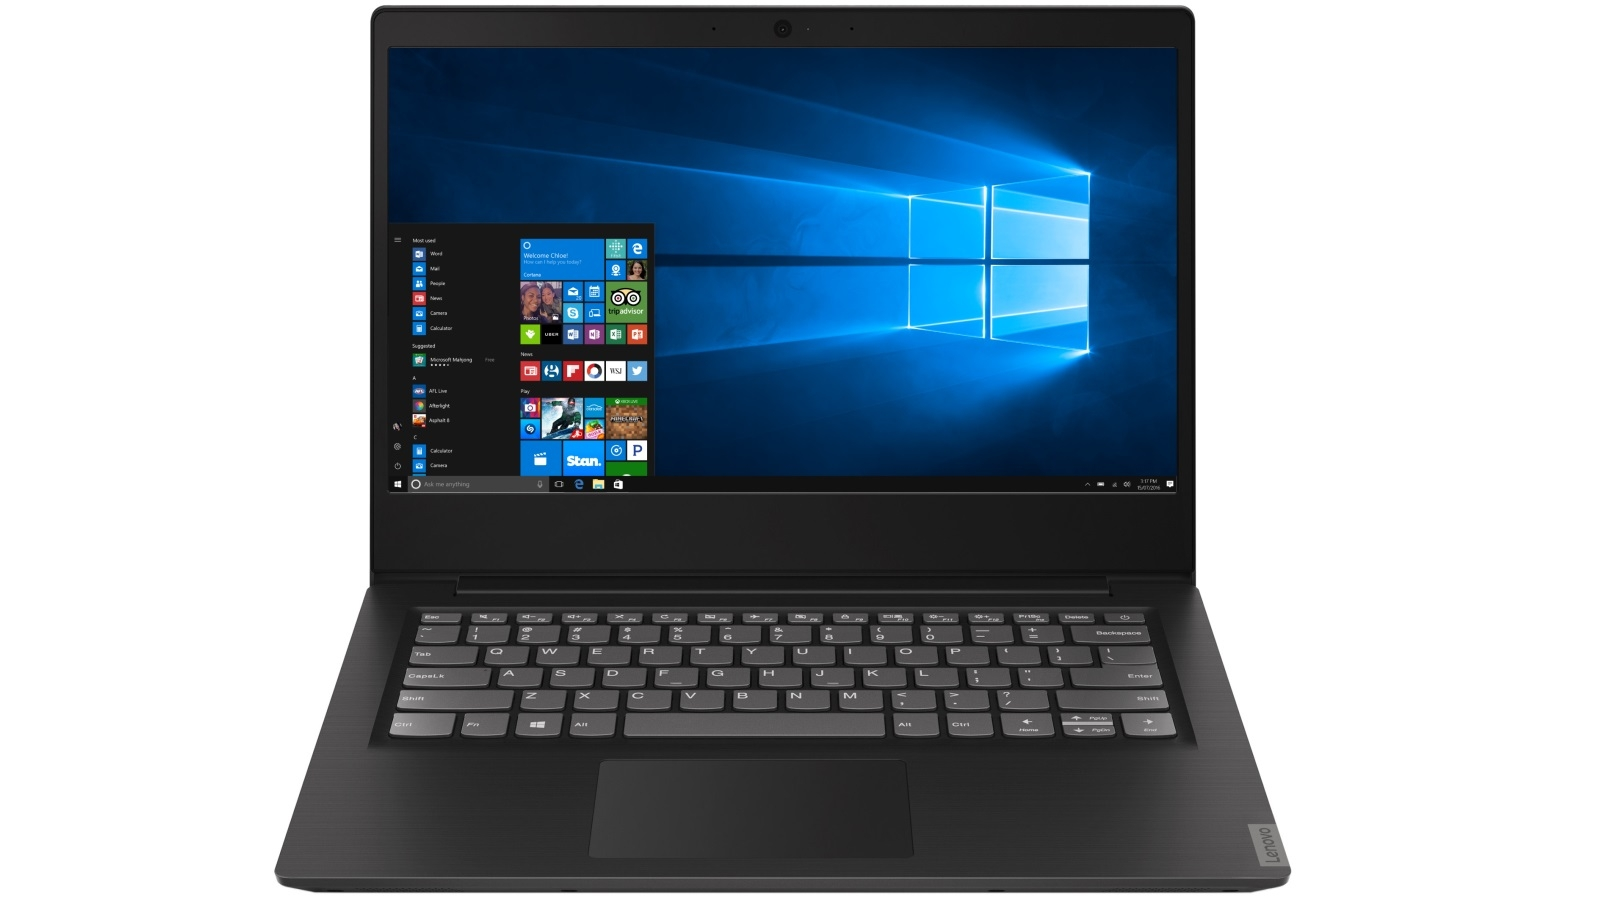 Image of Lenovo IdeaPad S145 14-inch A6-9225/4GB/128GB SSD Laptop